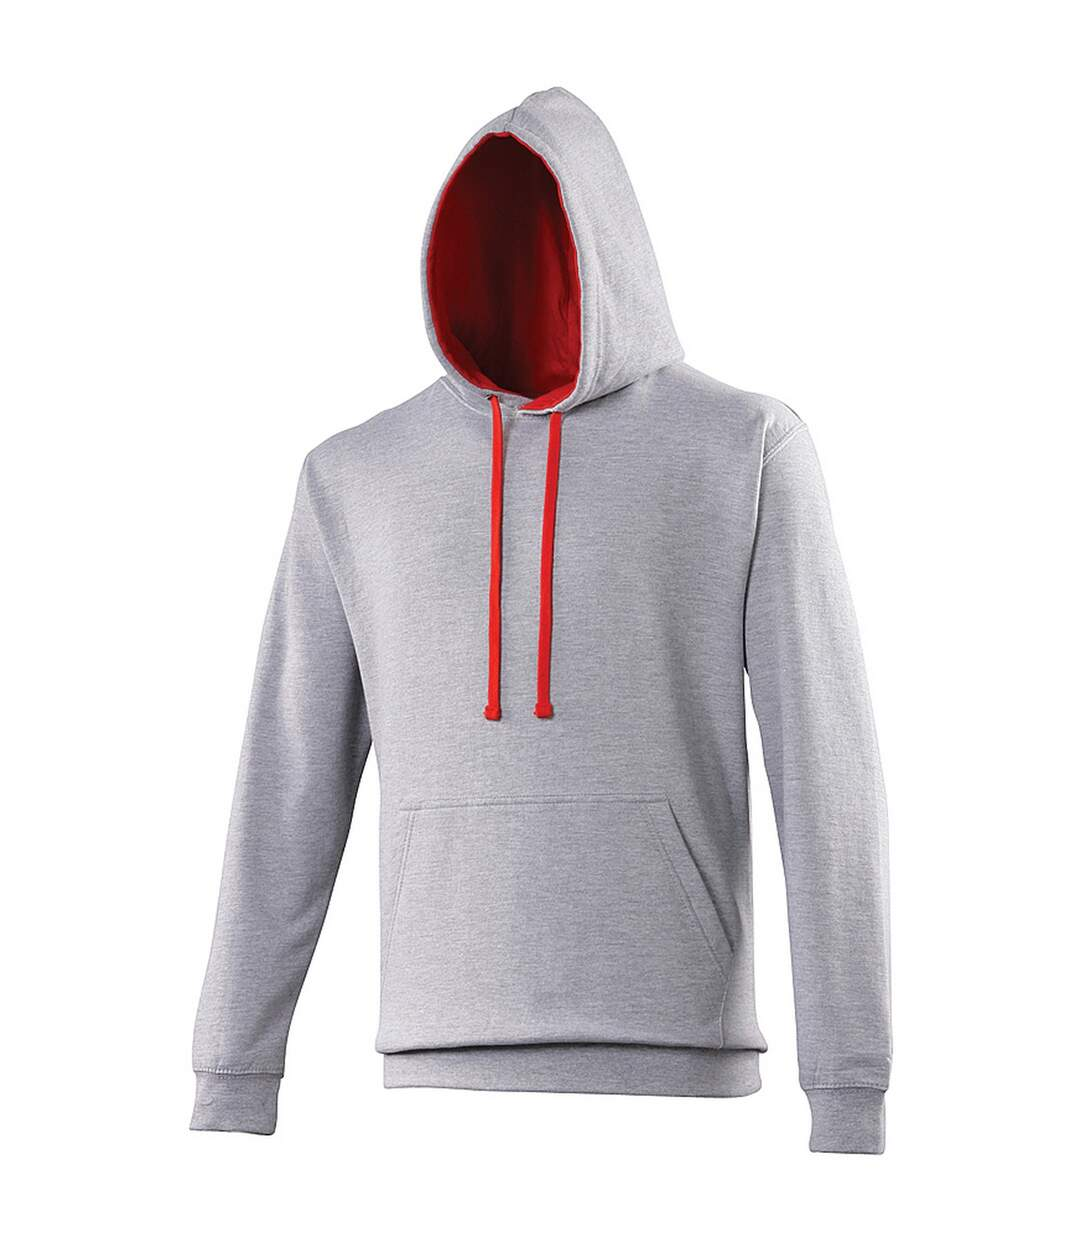 Awdis Varsity Hooded Sweatshirt / Hoodie (Jet Black/Orange Crush) - UTRW165